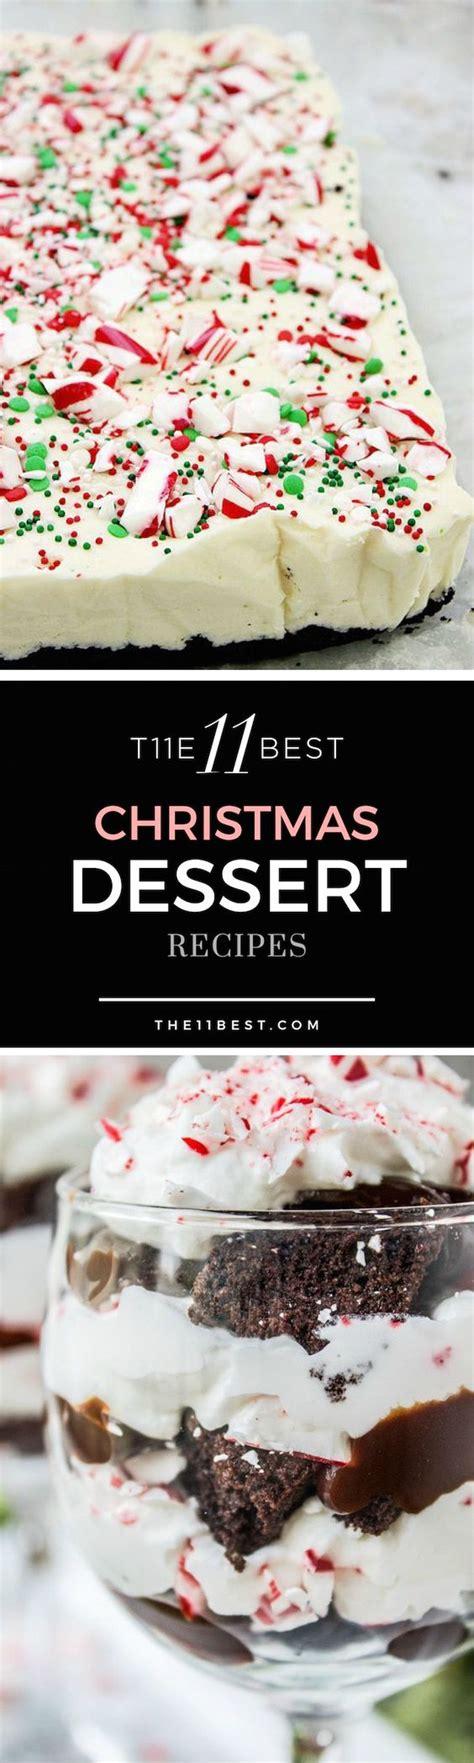 the best homemade christmas dessert recipes dessert